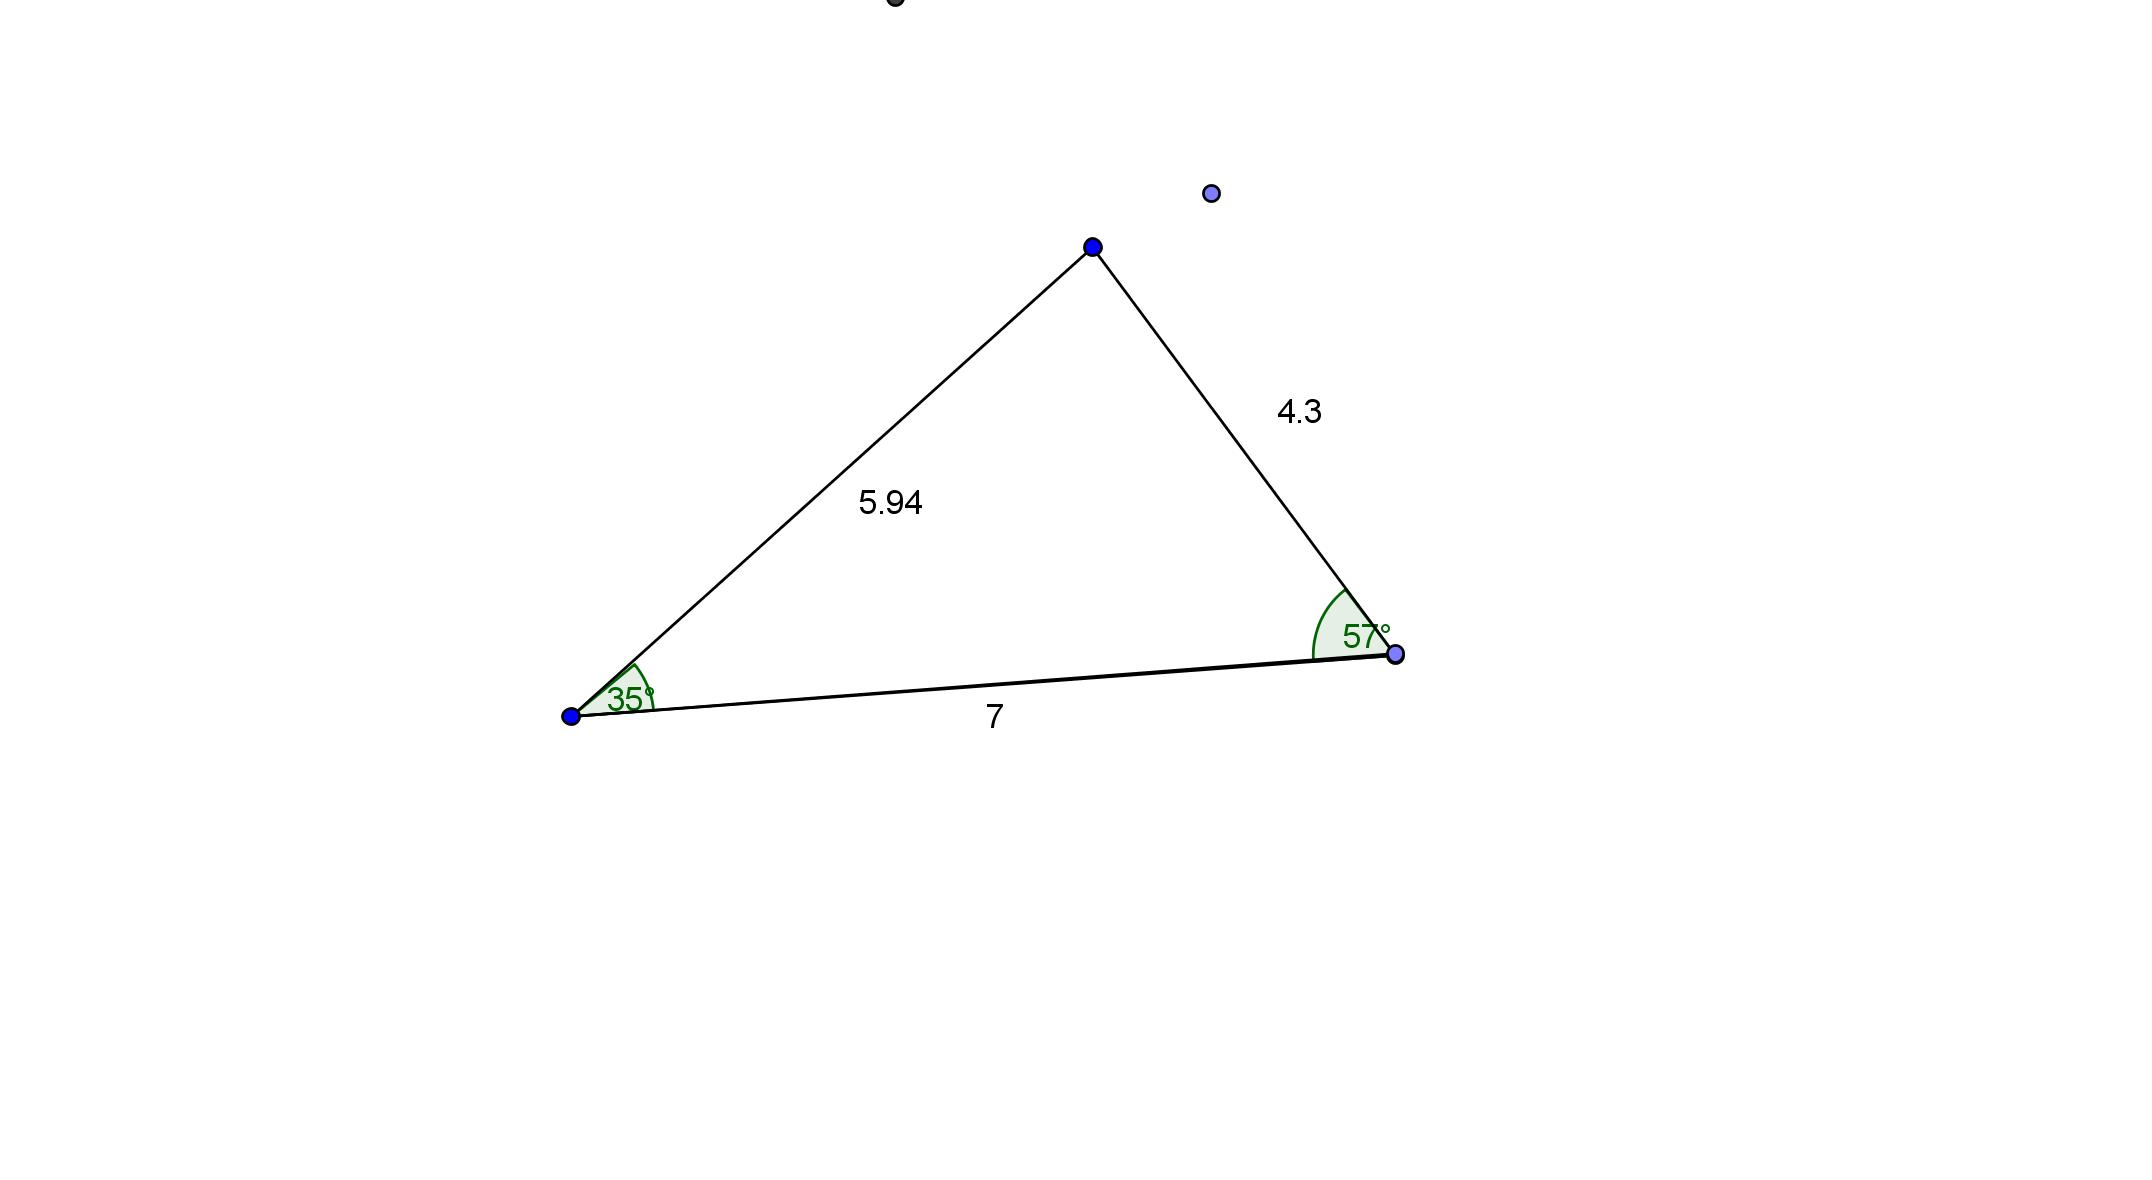 Congruent Triangles In Bridges Three different triangles